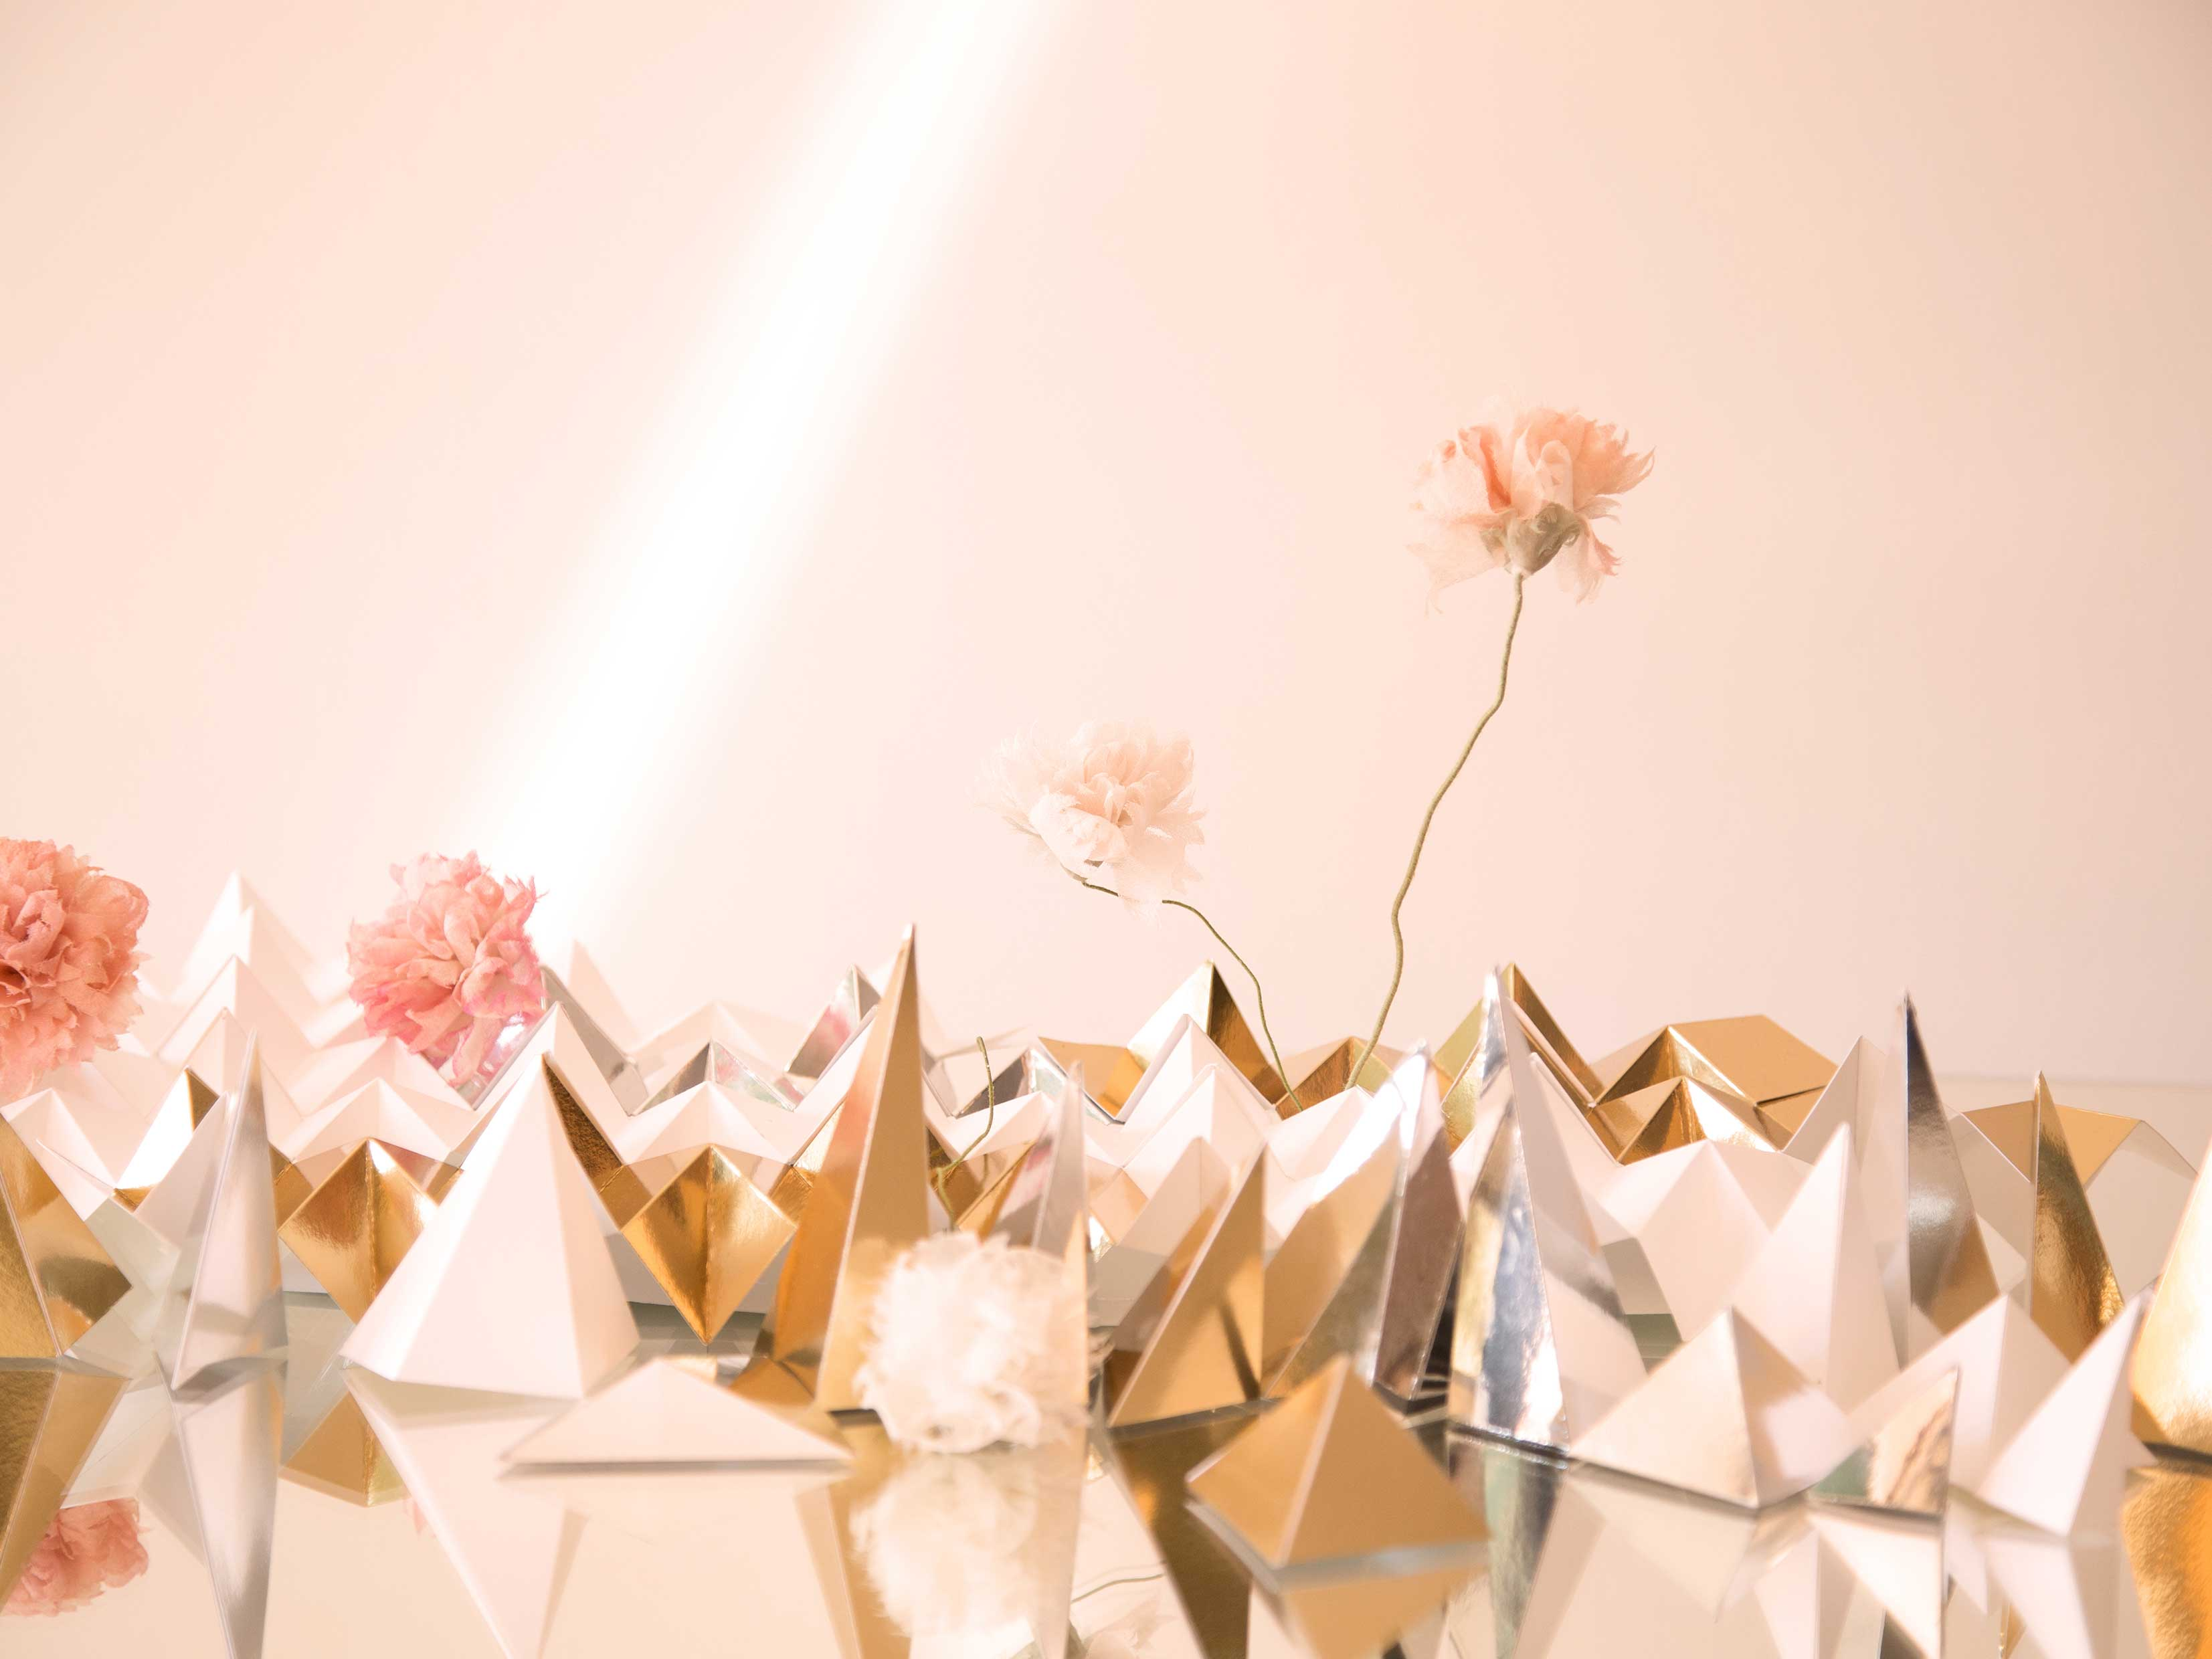 Fleur et Catapulte, Núria Cienfuegos Photography, Decoració efímera, Andrea Alcalá